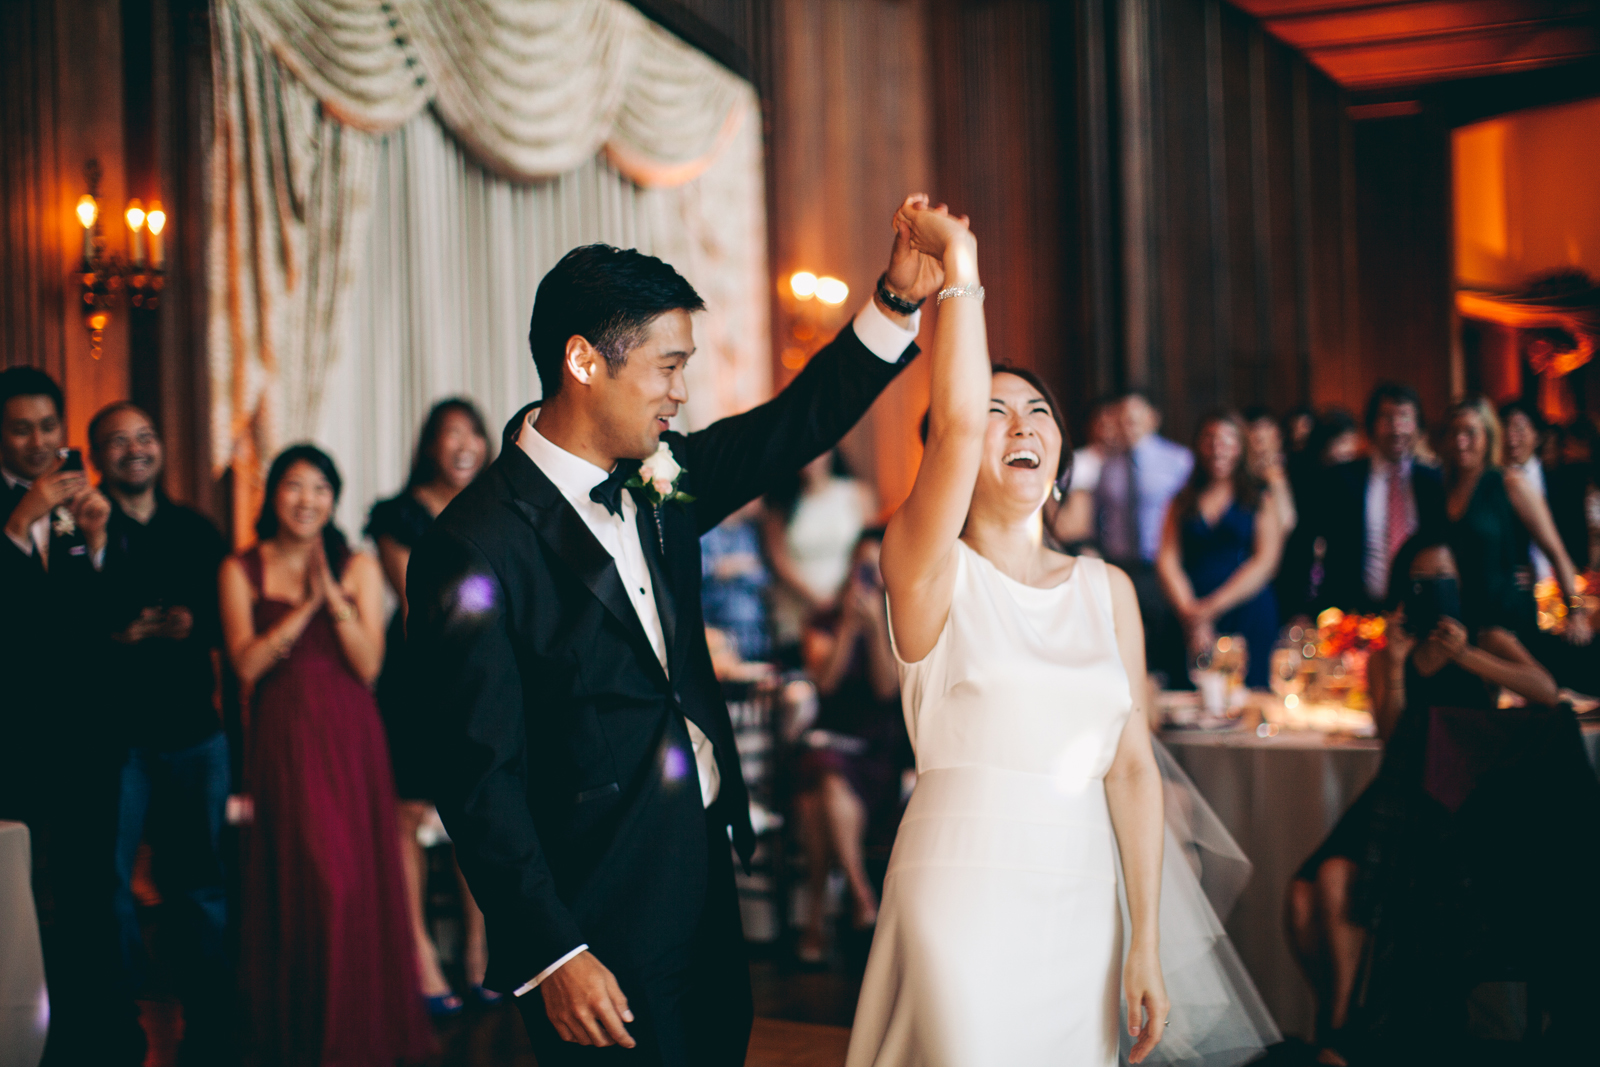 kohl_manison_wedding_photography_sarah_eric_ebony_siovhan_bokeh_photography_083.jpg